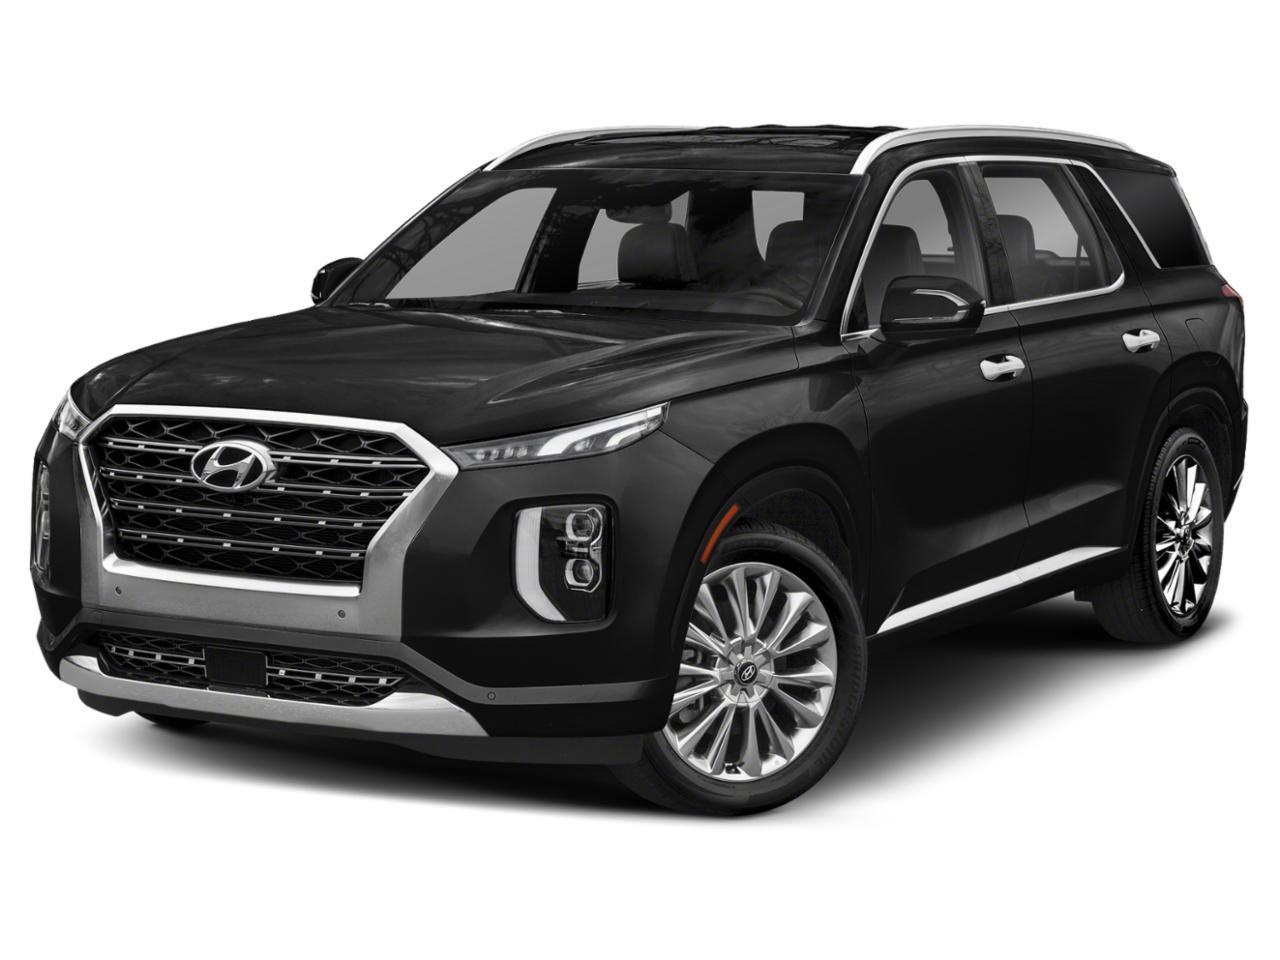 2020 Hyundai Palisade Vehicle Photo in Odessa, TX 79762